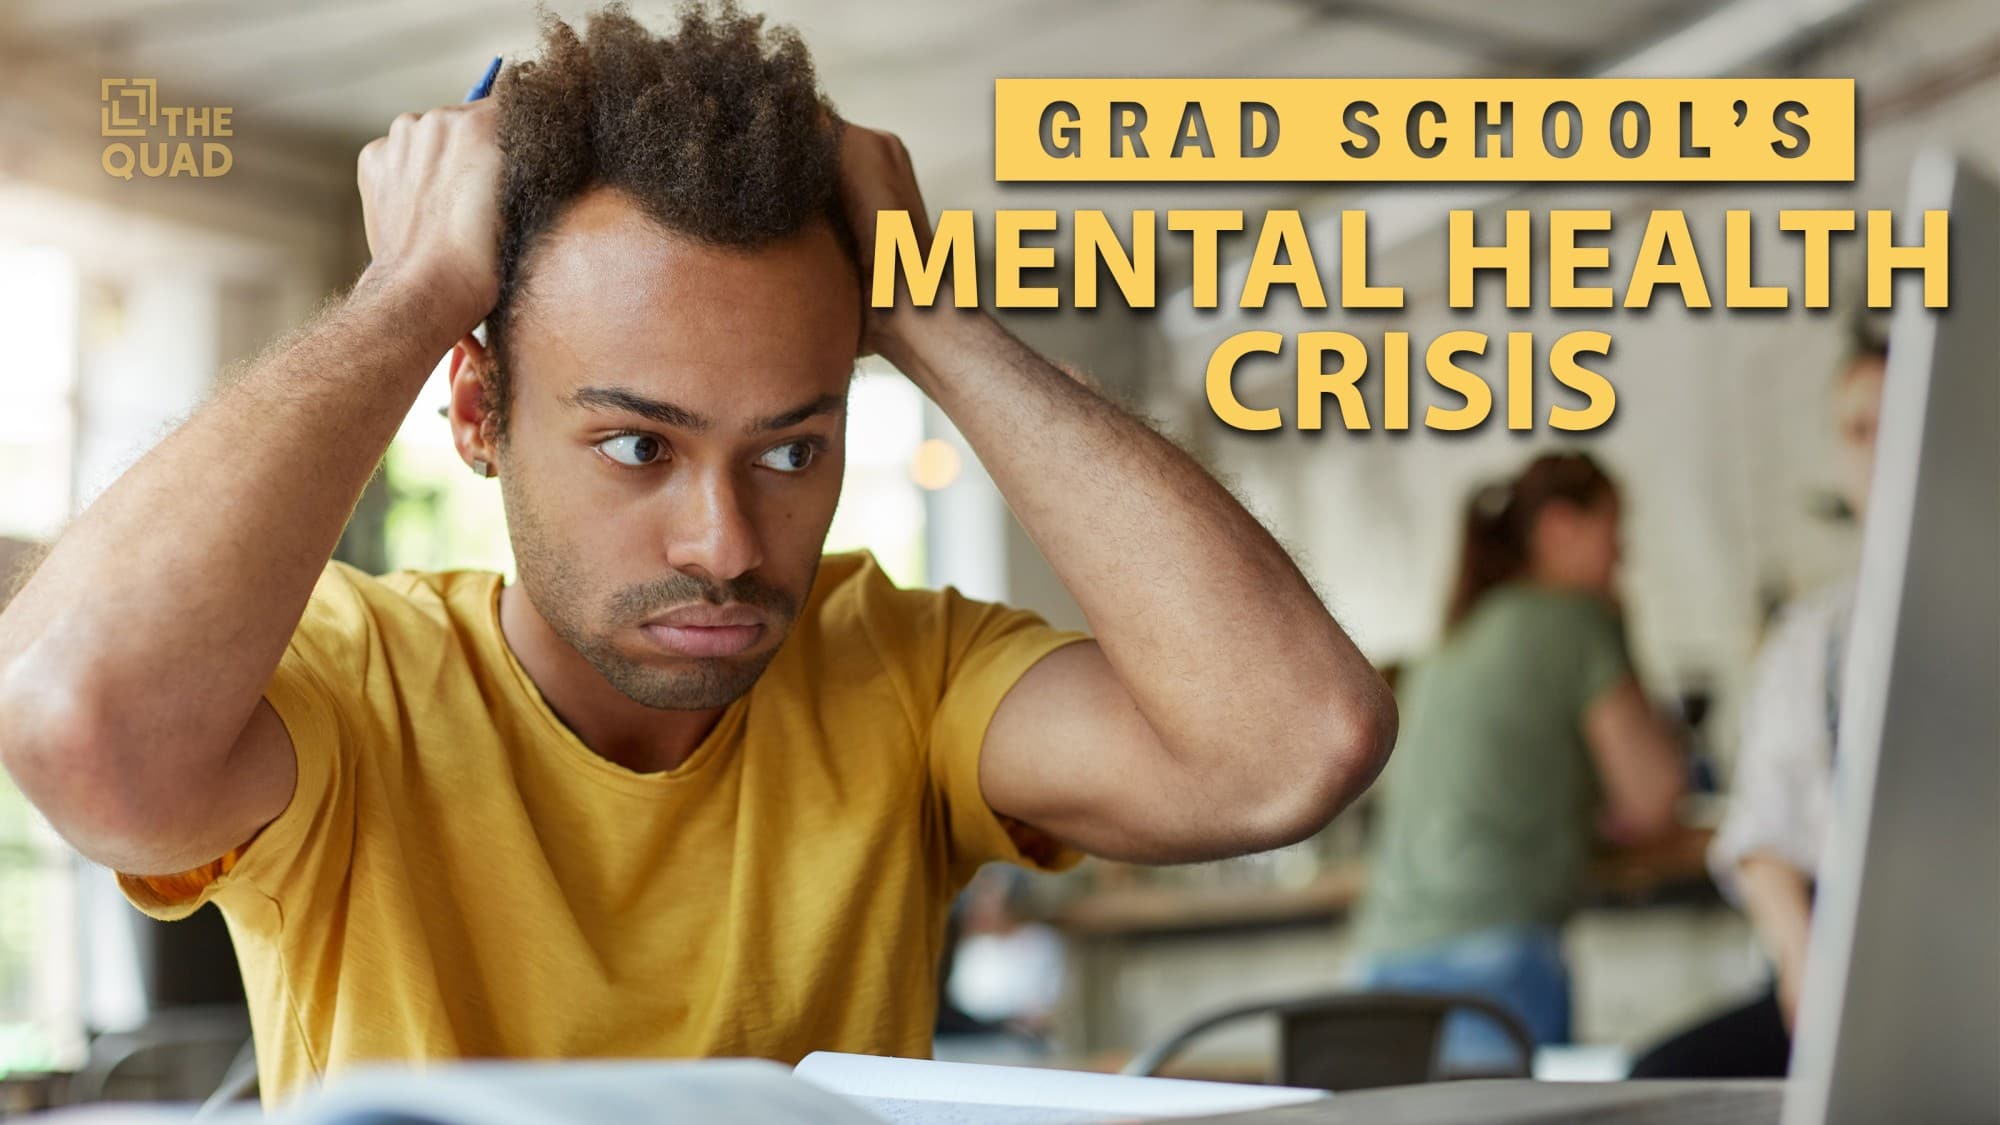 Anxious Students Strain College Mental >> Grad School S Mental Health Crisis The Quad Magazine